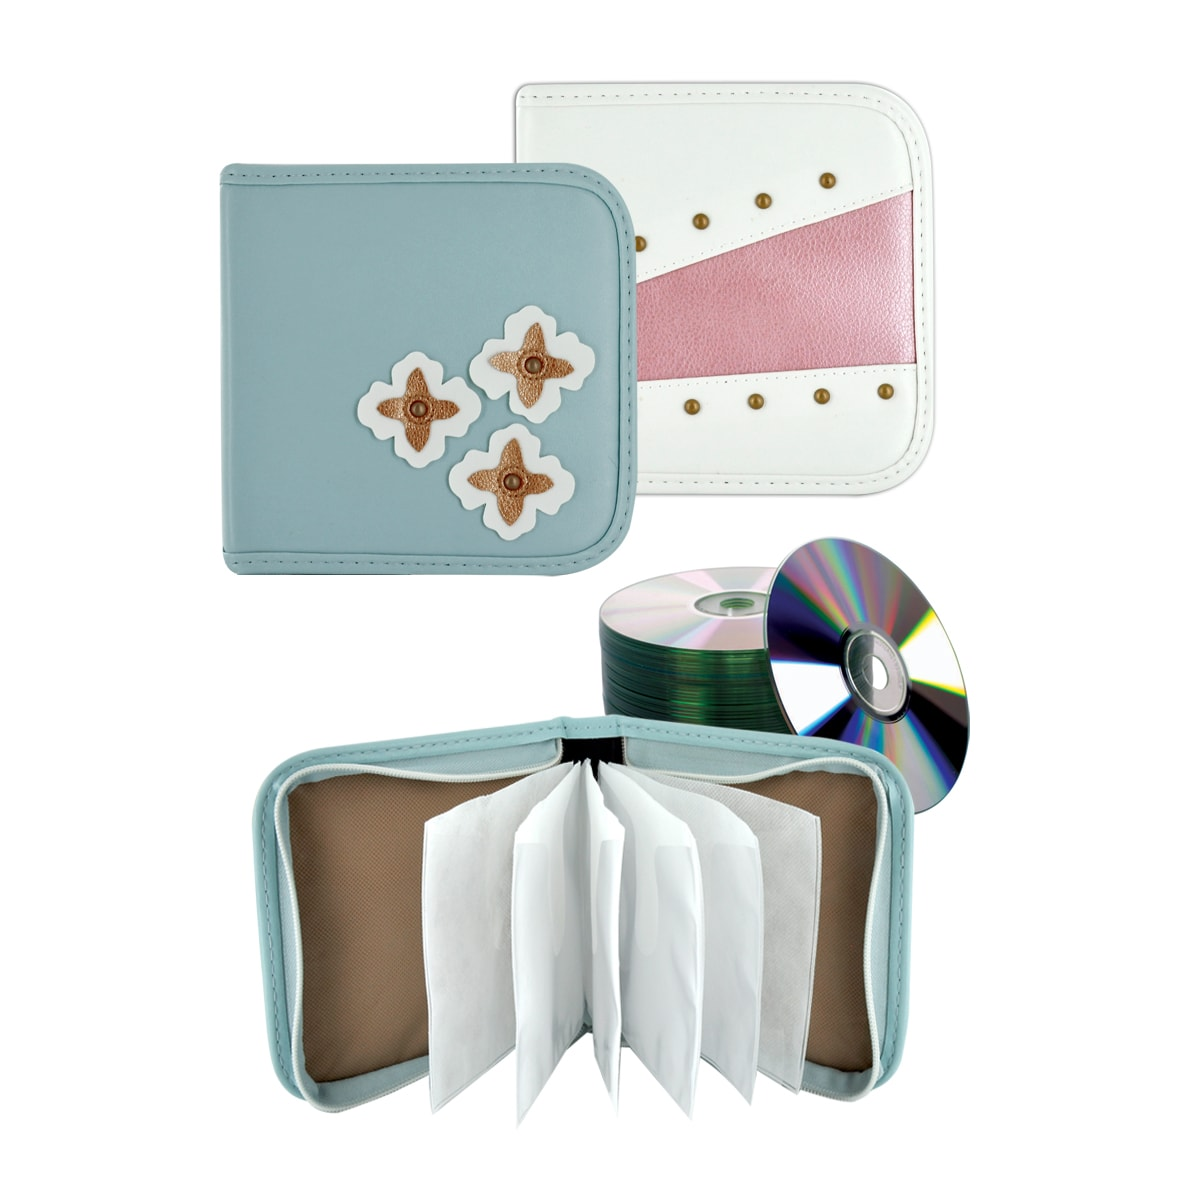 Target 16 Capacity CD/DVD Wallet Holder by Case Logic (Pack of 2)